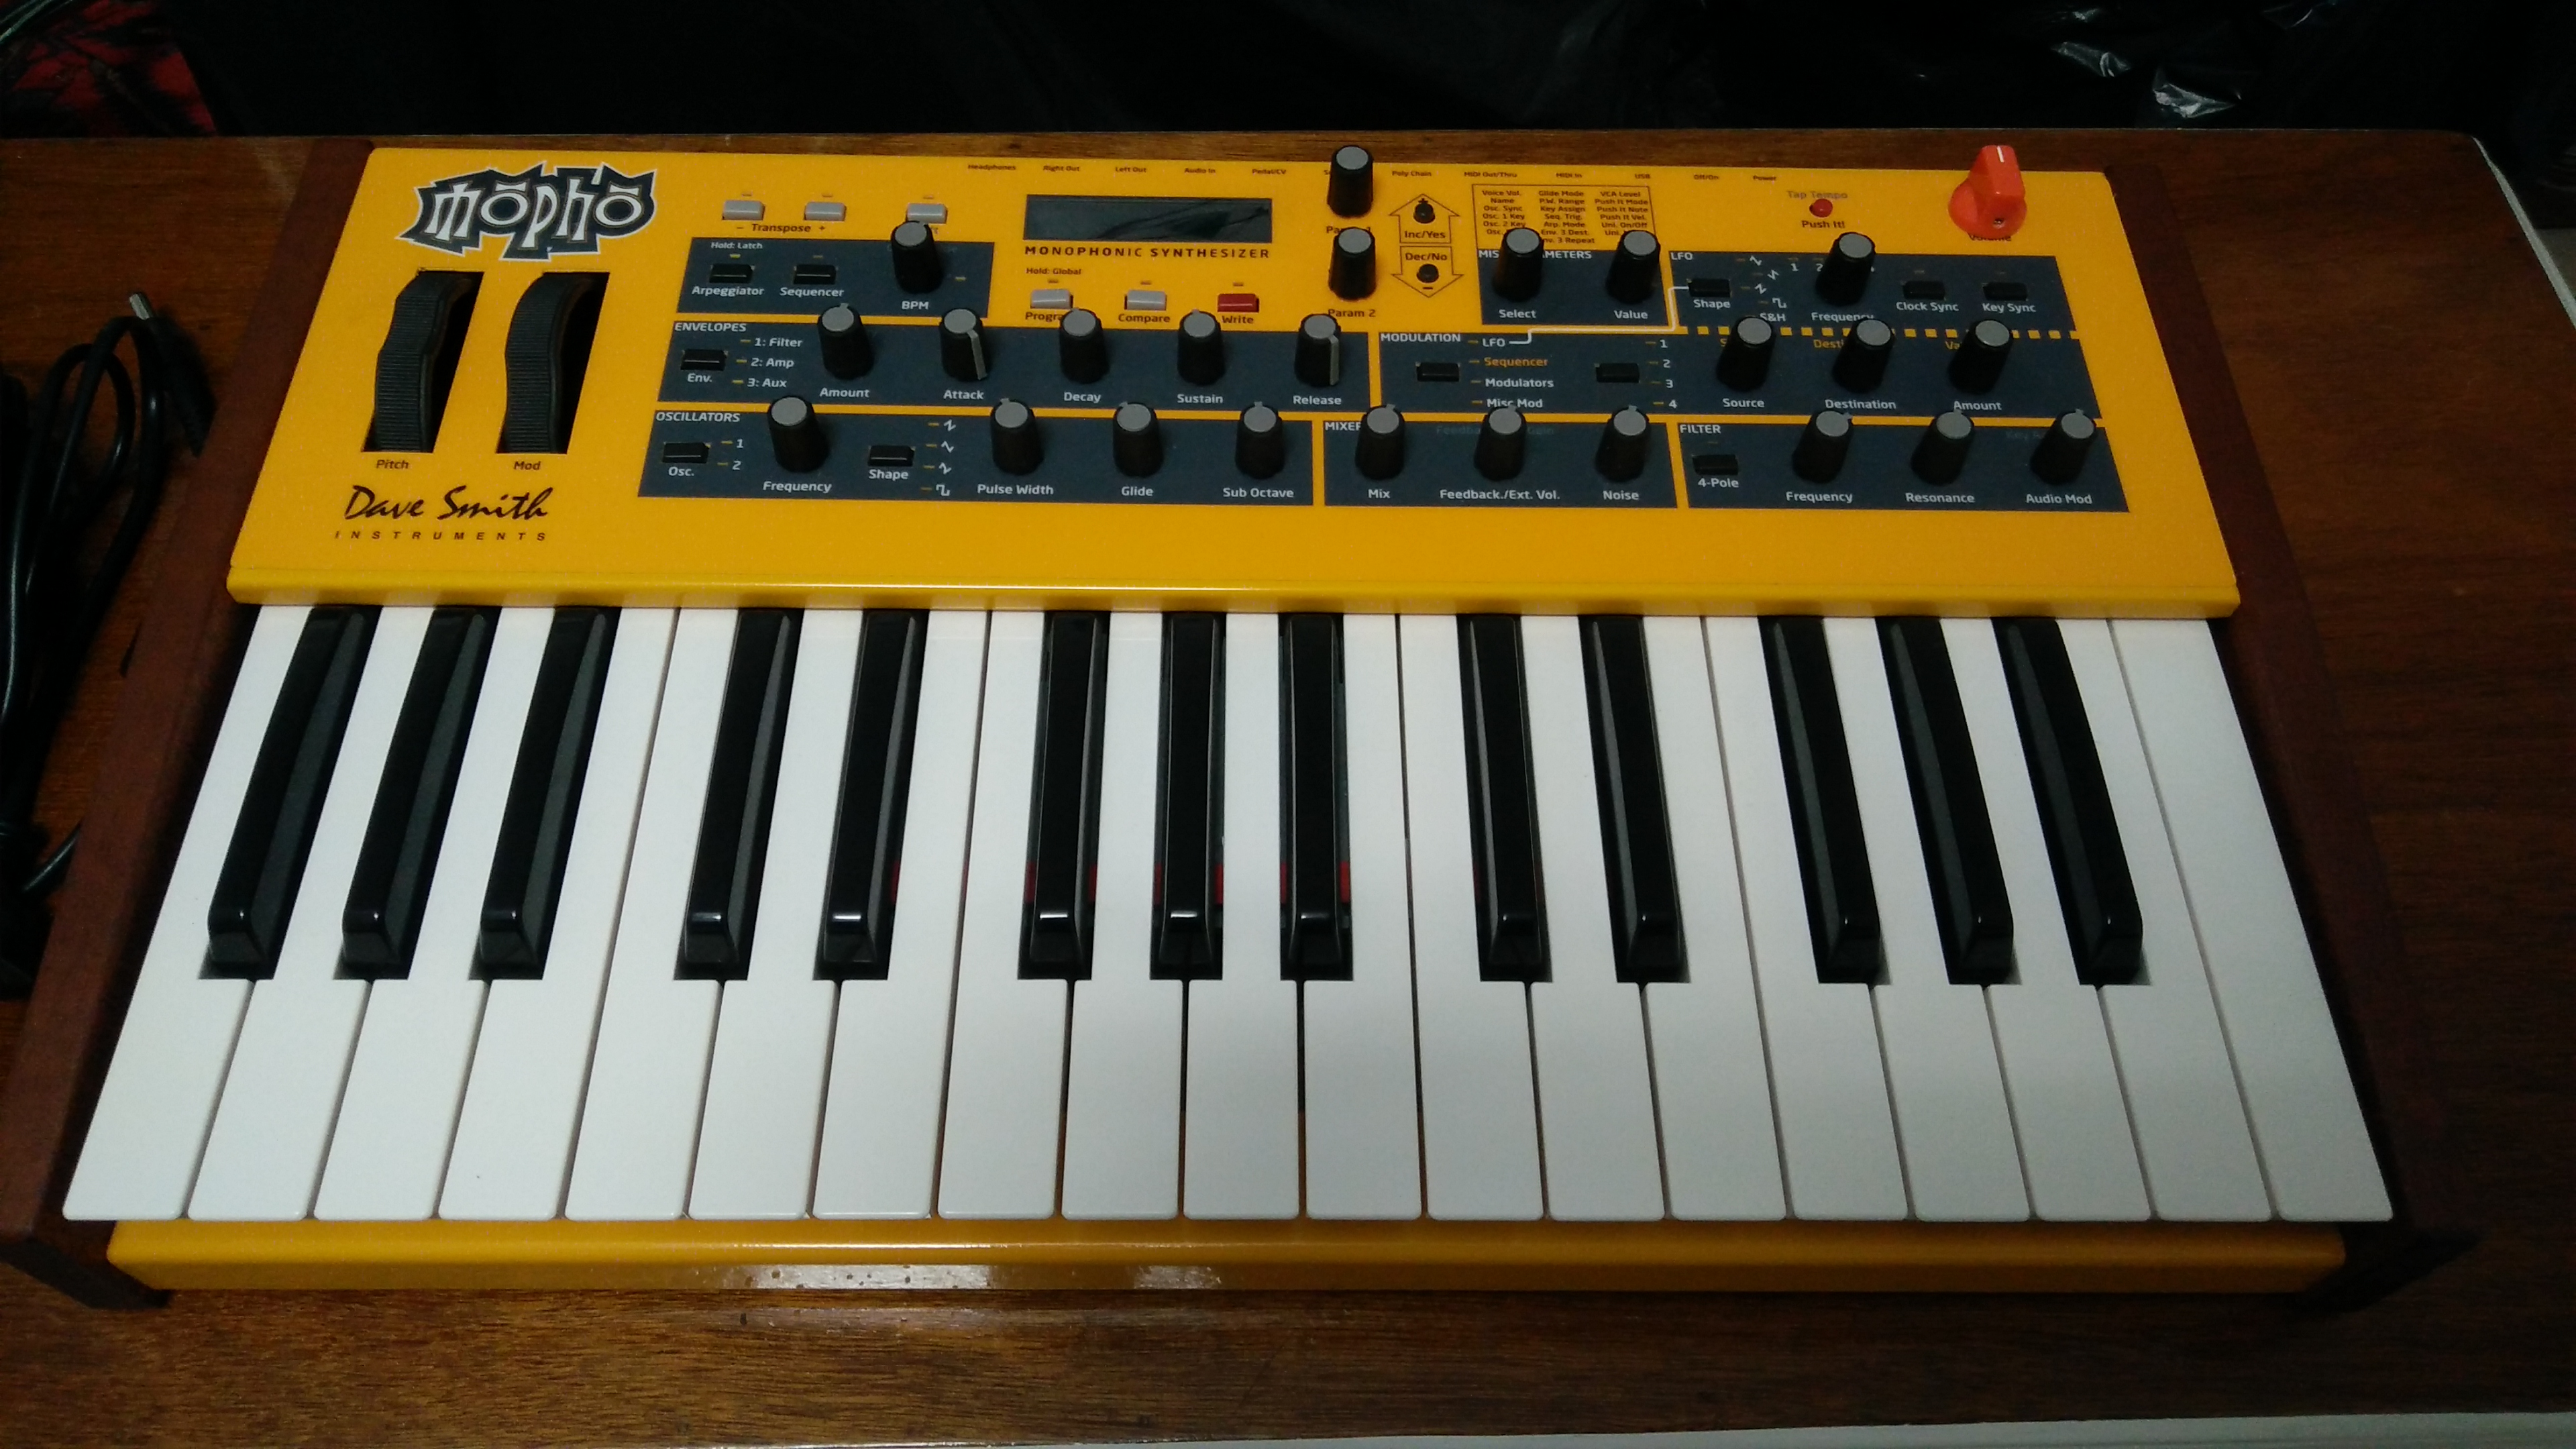 dave smith instruments mopho keyboard image 1577859 audiofanzine. Black Bedroom Furniture Sets. Home Design Ideas